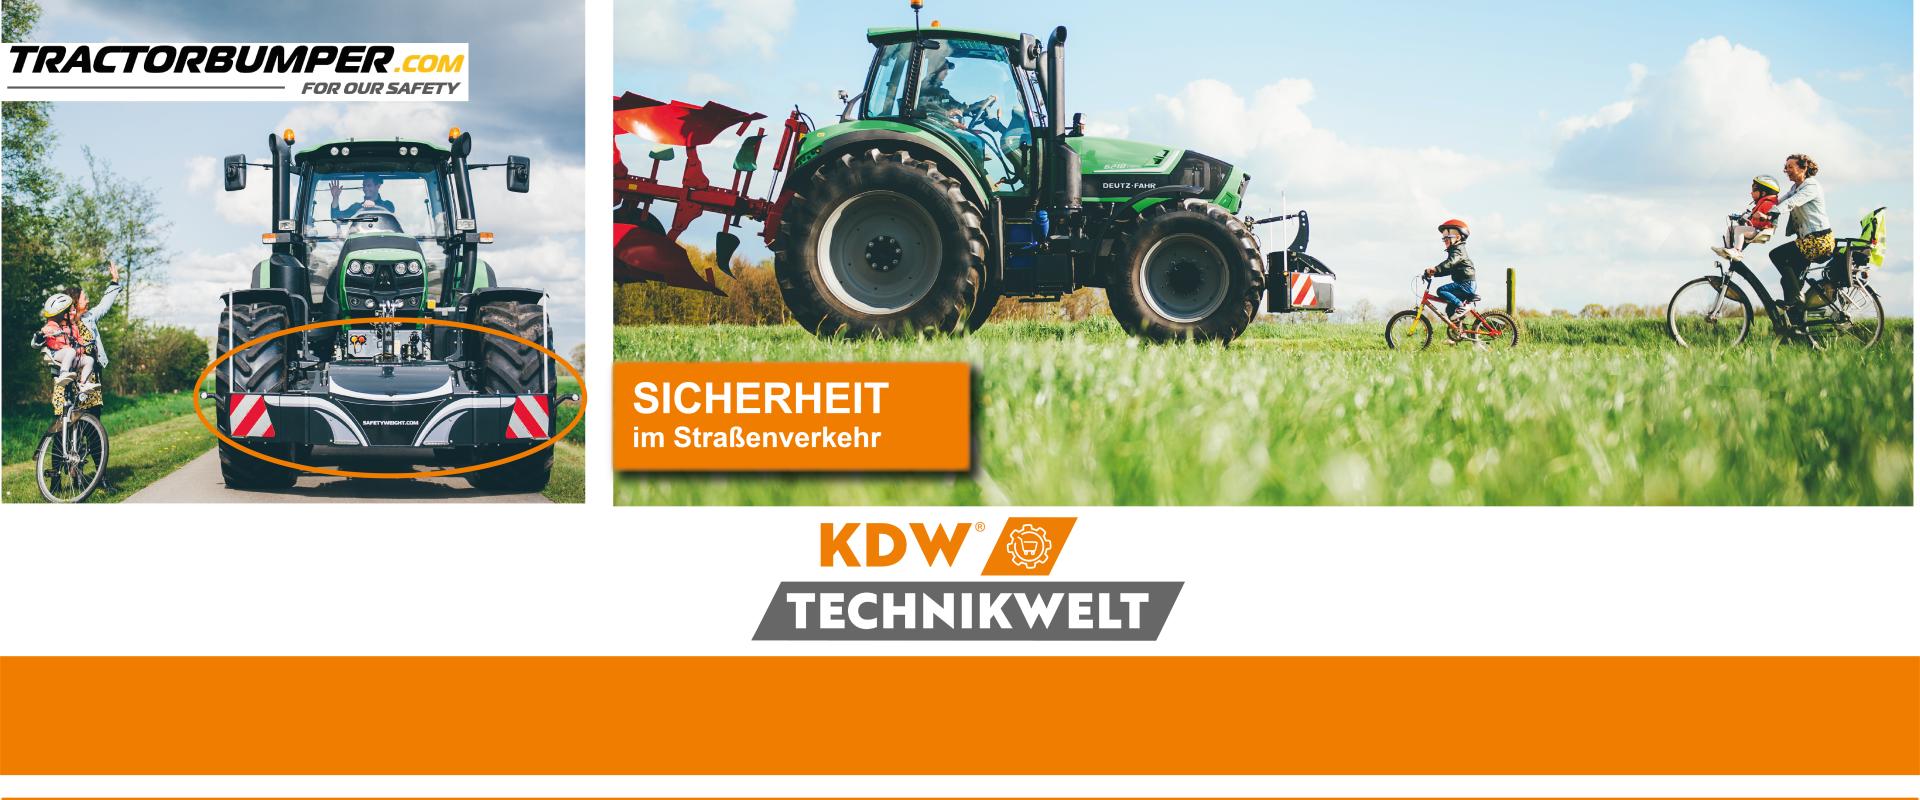 KDW Technikwelt Tractorbumper